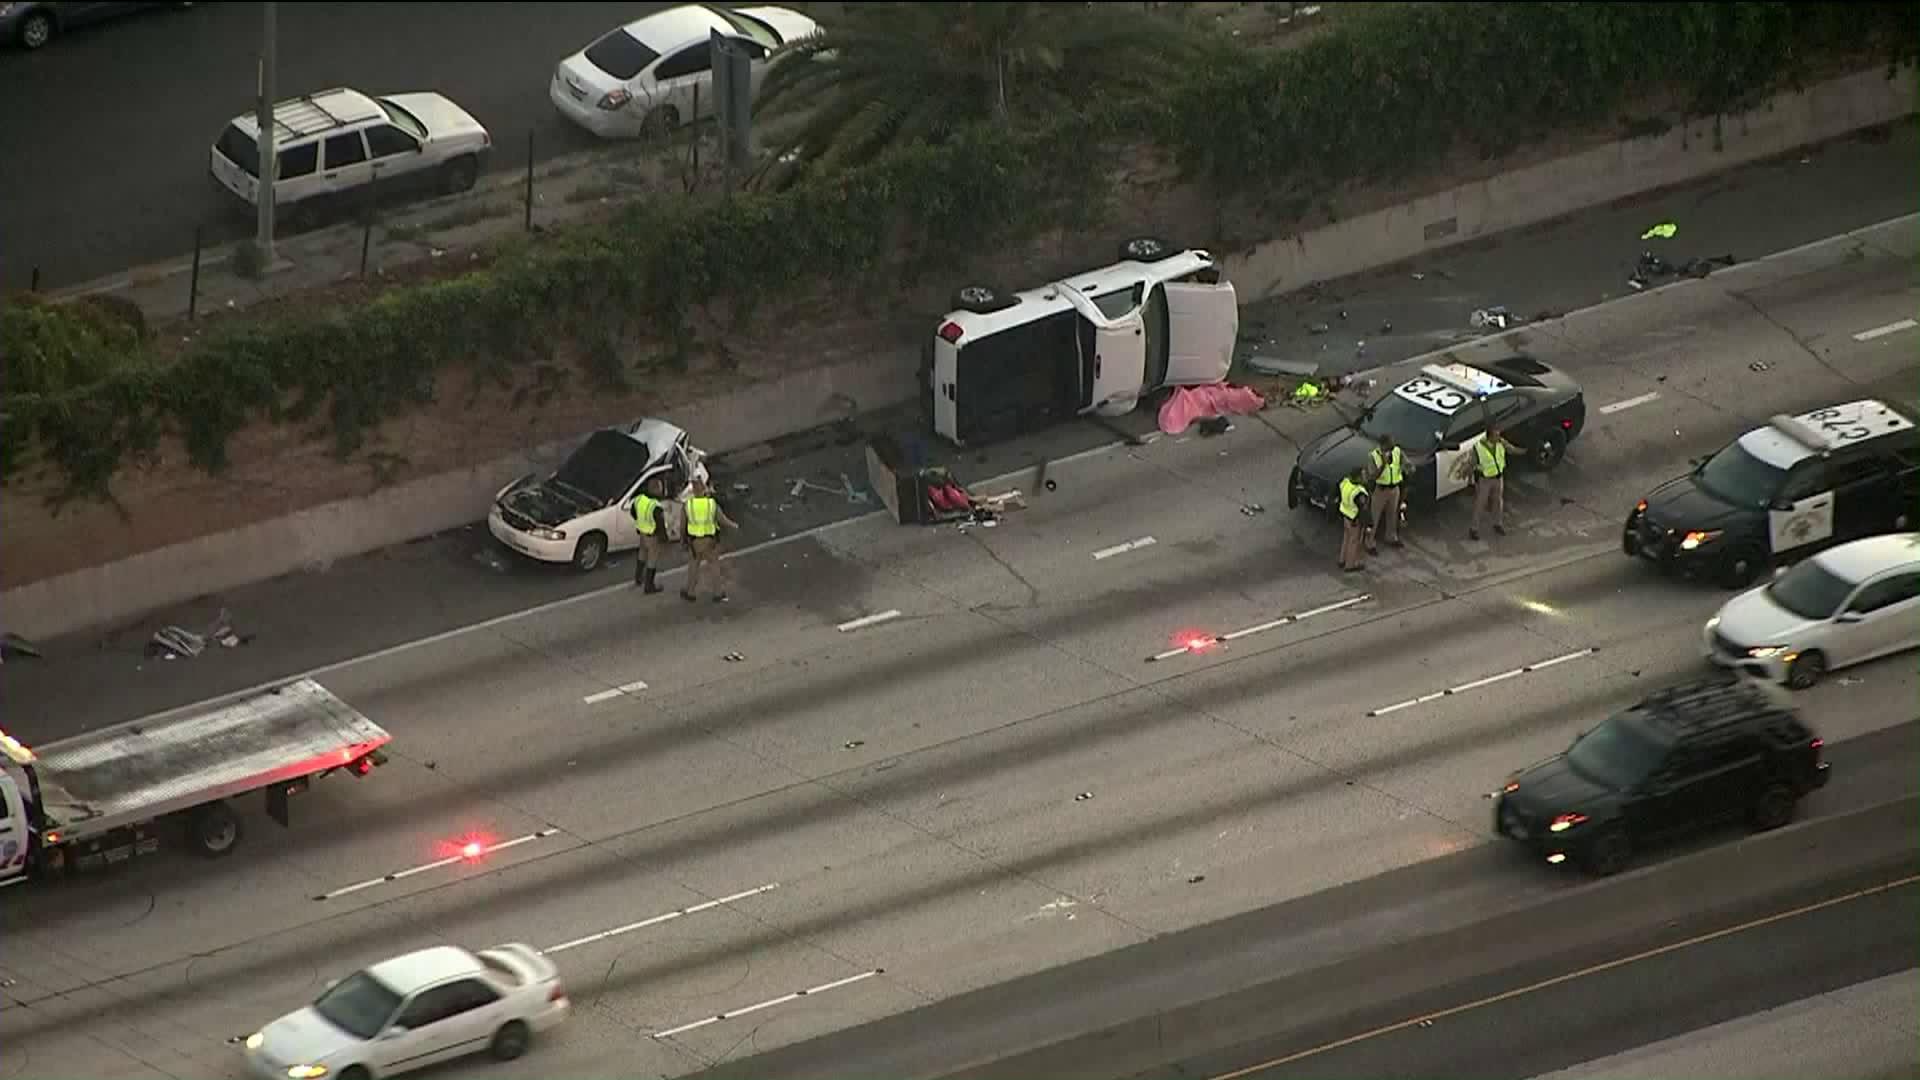 The scene of a fatal collision on the 10 Freeway in La Brea on May 2, 2019. (Credit: KTLA)